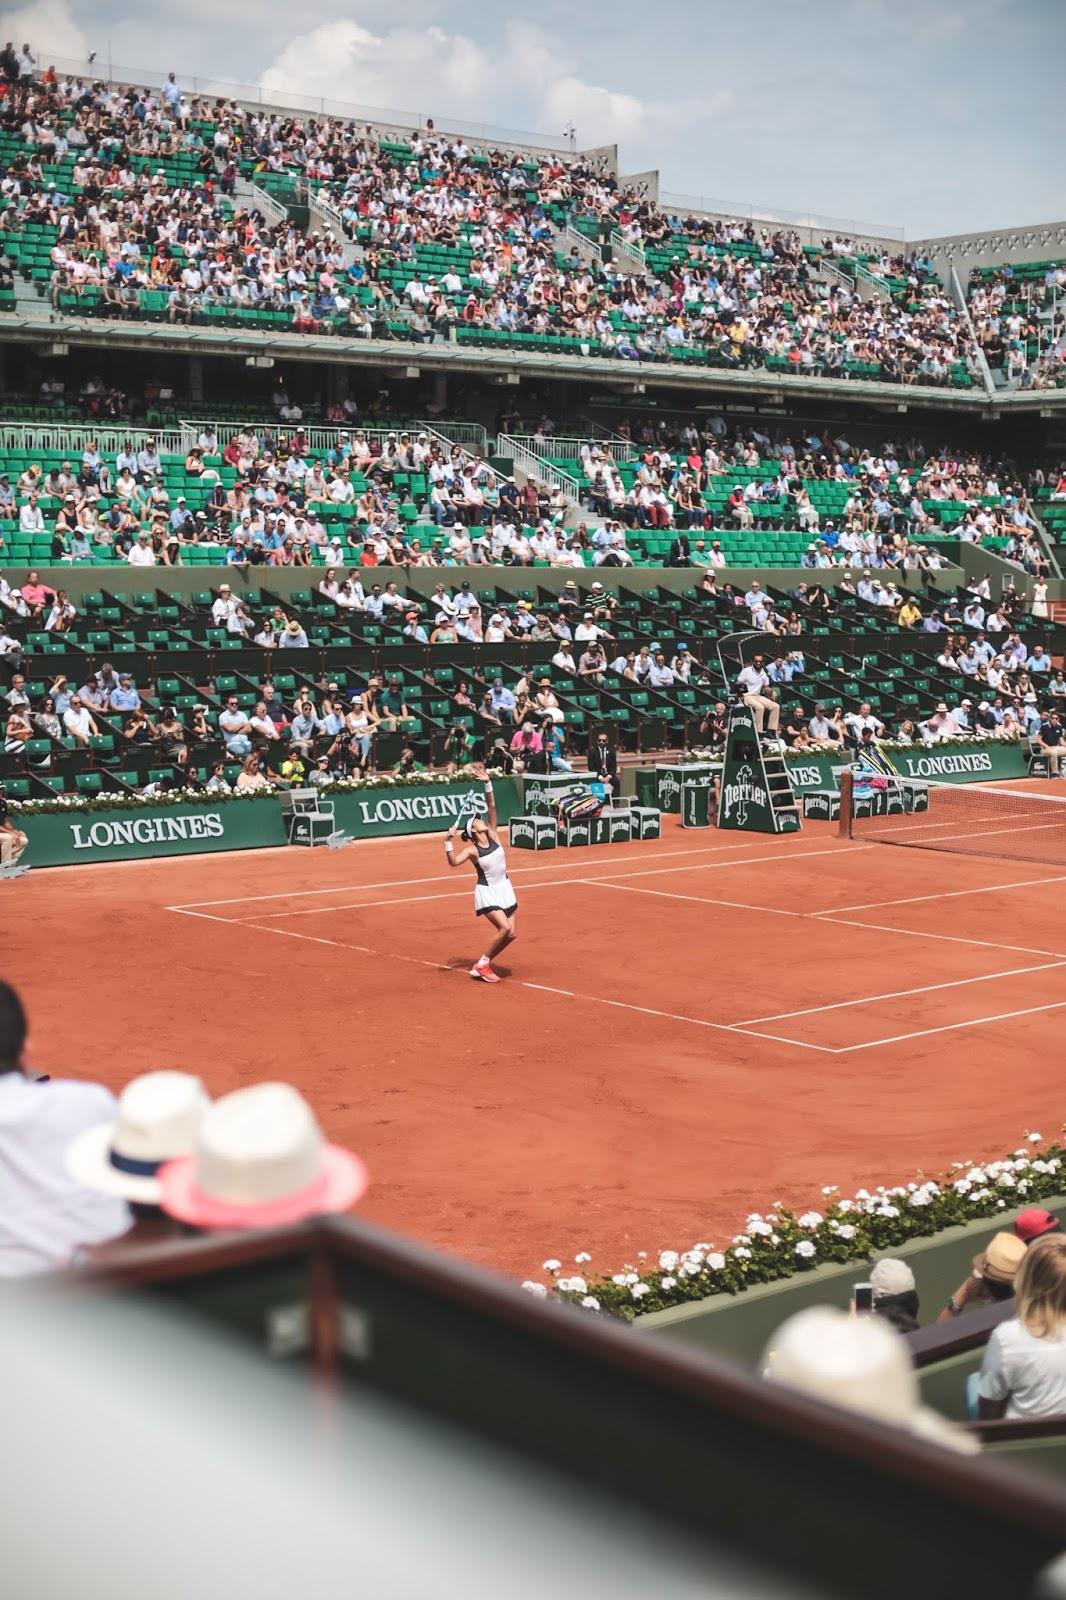 Muguruza vs. Putintseva Roland Garros 2017